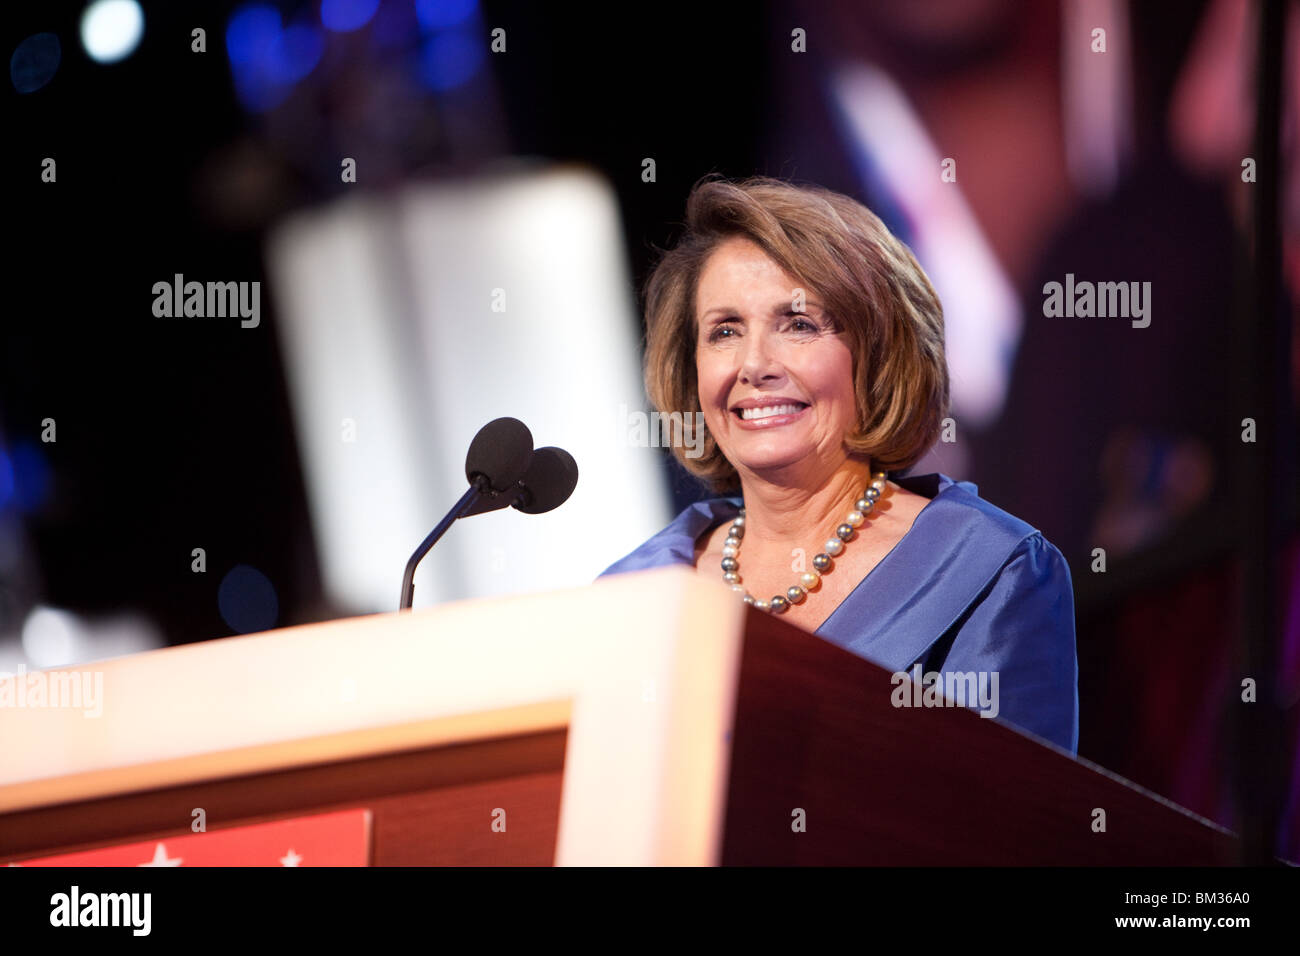 Nancy Pelosi Keynote - Stock Image